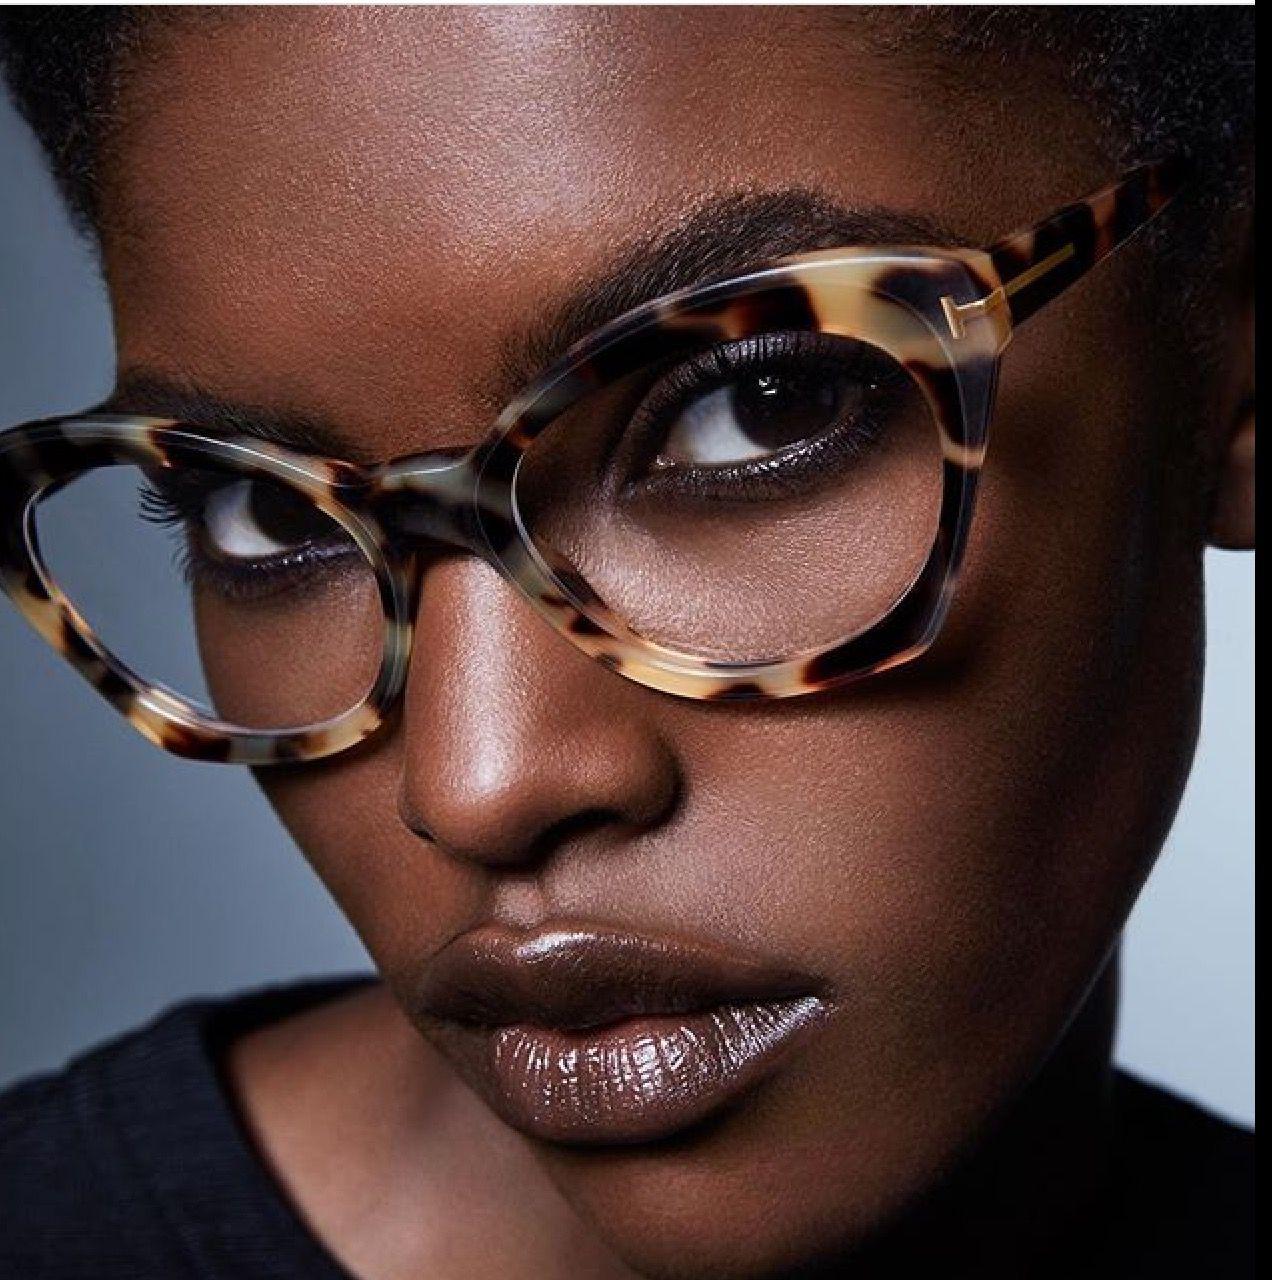 global market glasses sugarltd sugar womens ford rakuten online s in eyewear tom a stock eyeglasses item new store shop en men women